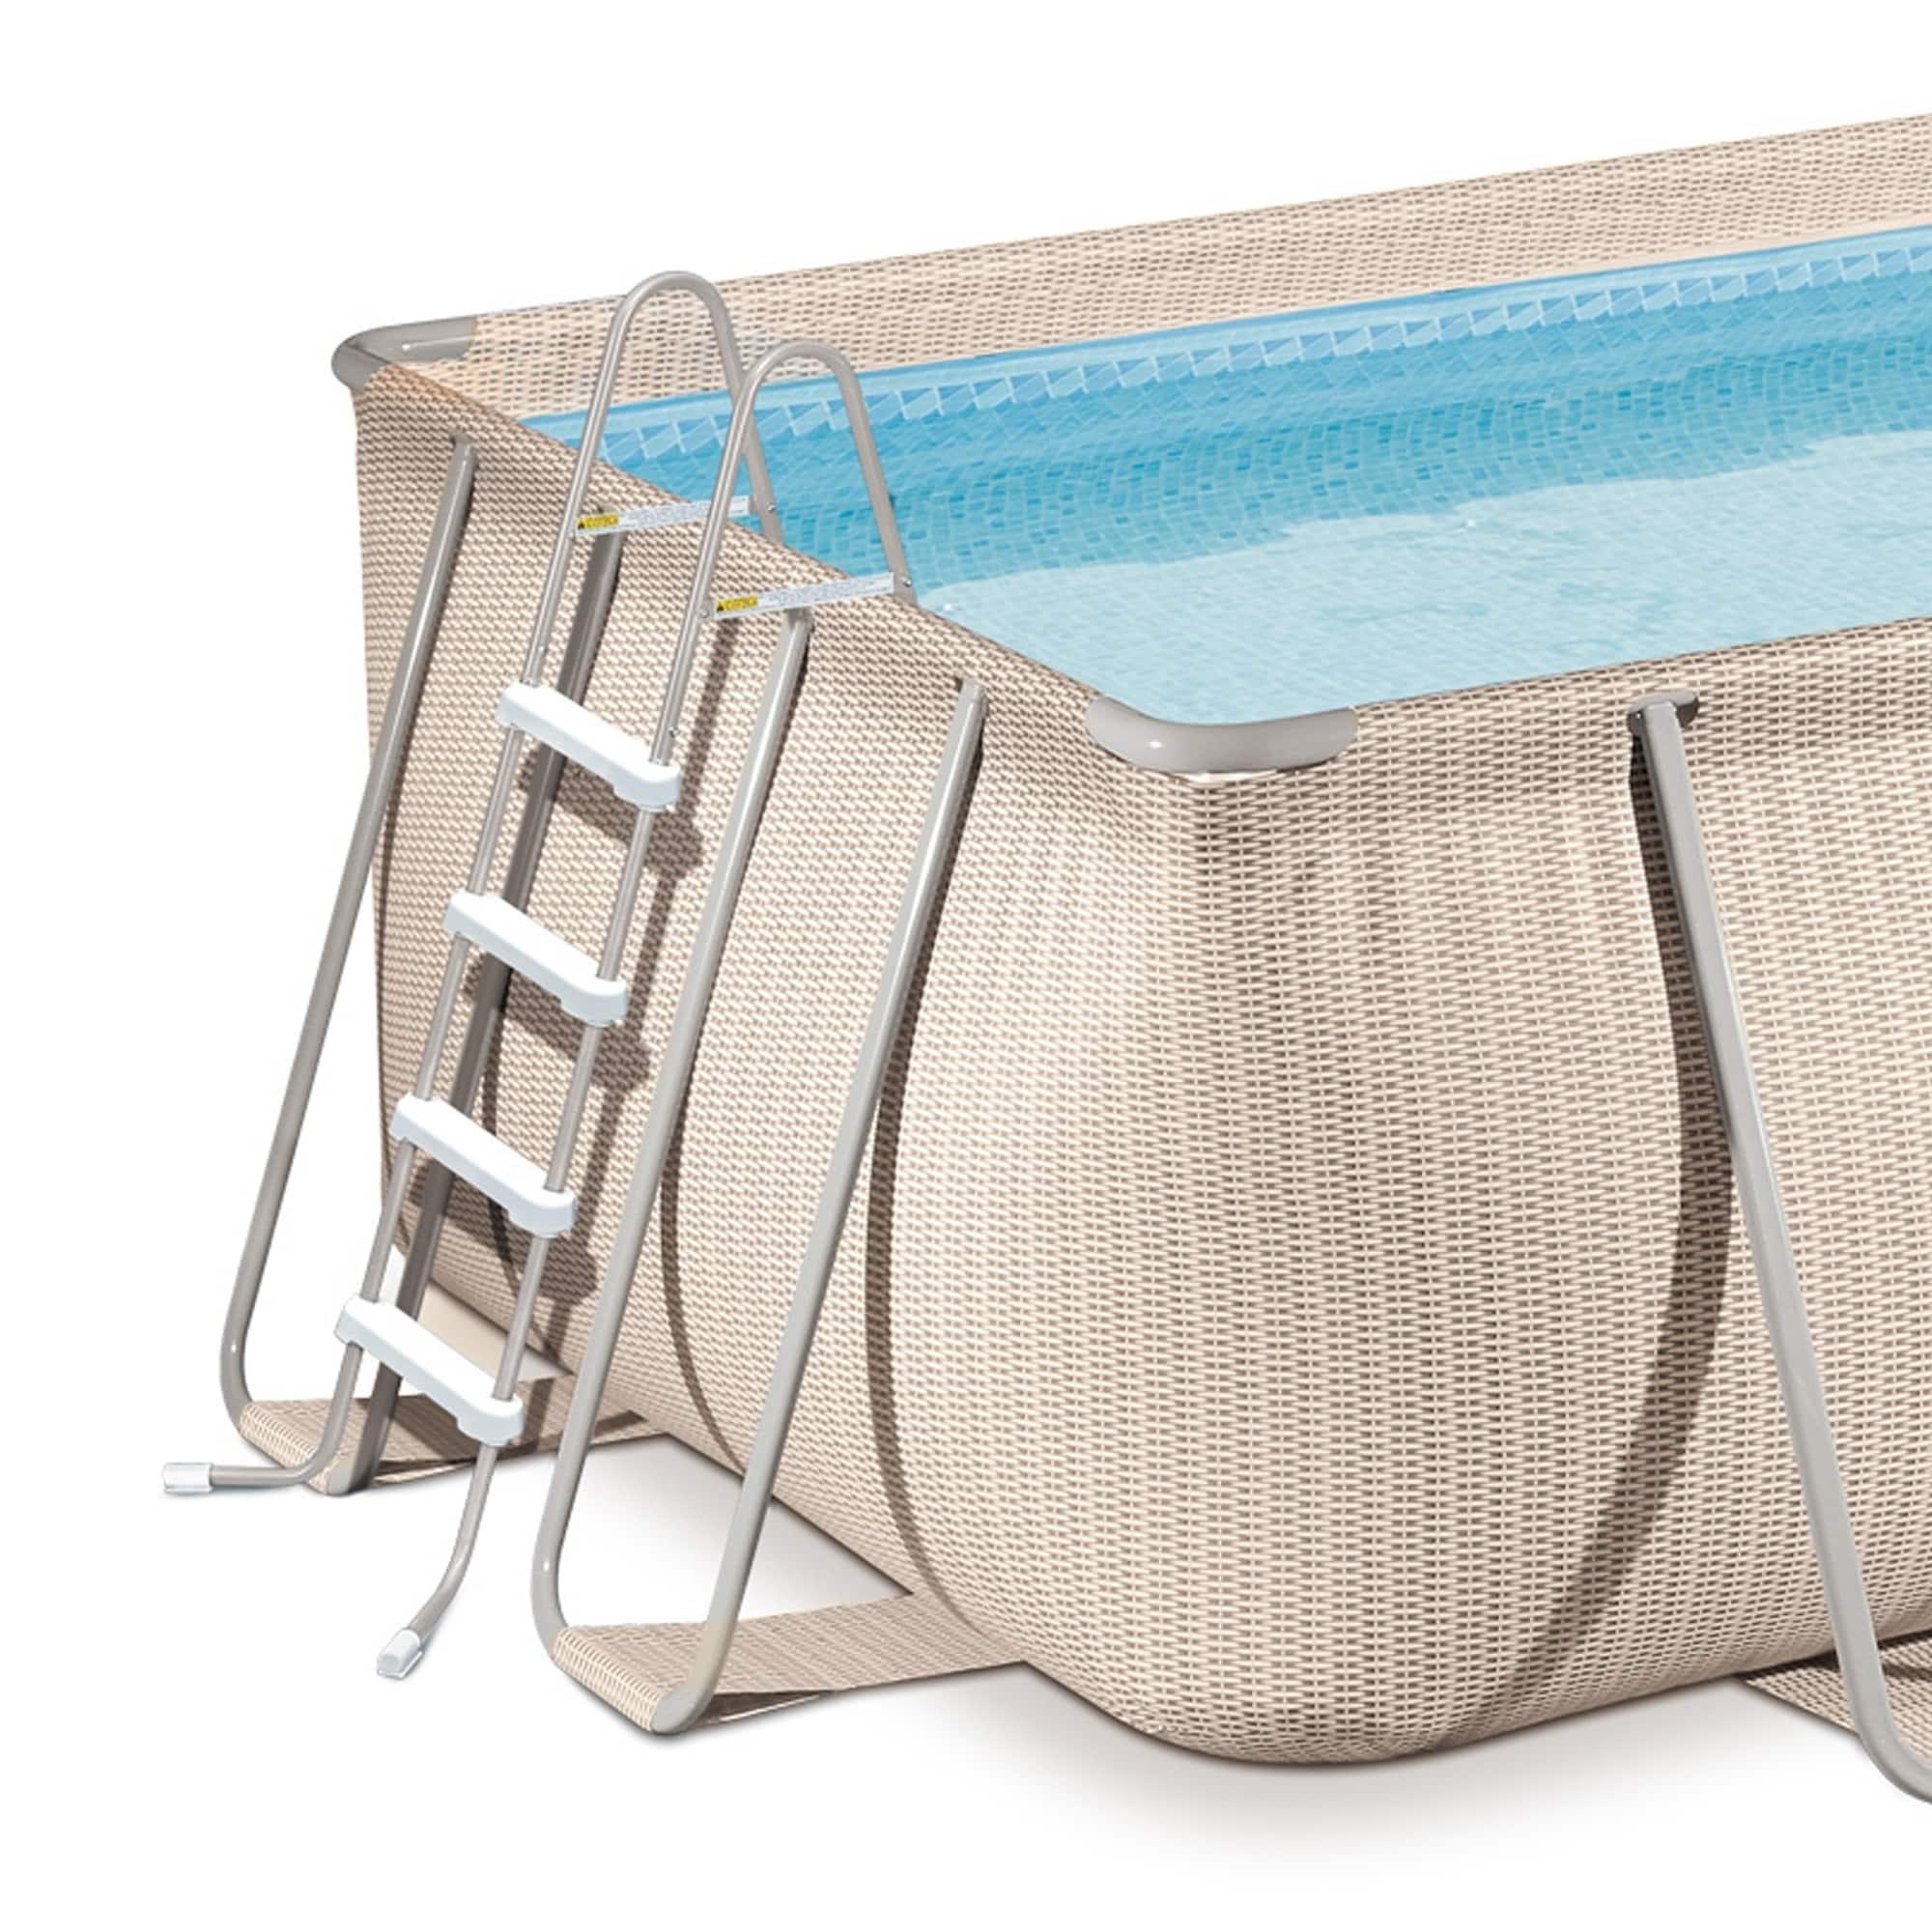 Shop Light Wicker 15-ft Round Metal Frame Pool Package - 48-in Deep ...